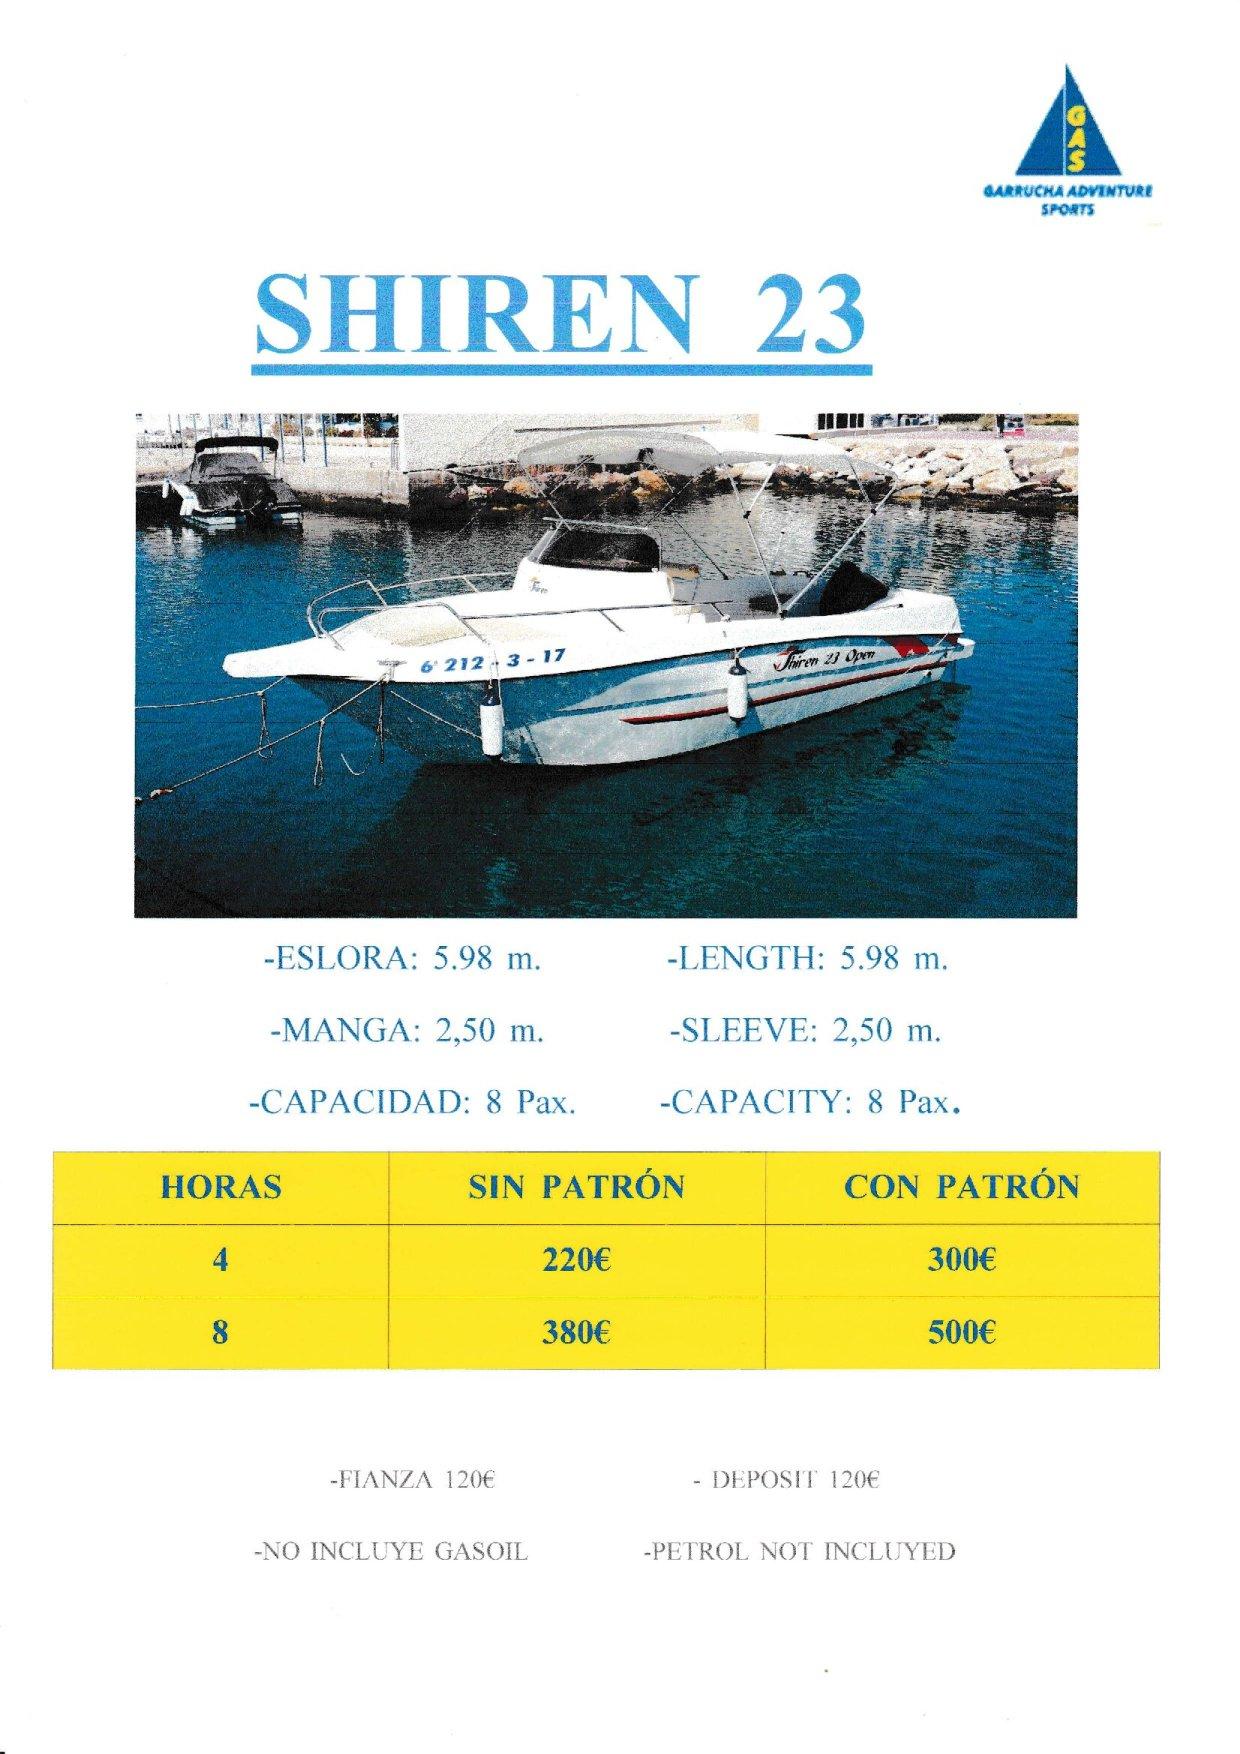 SHIREN 23